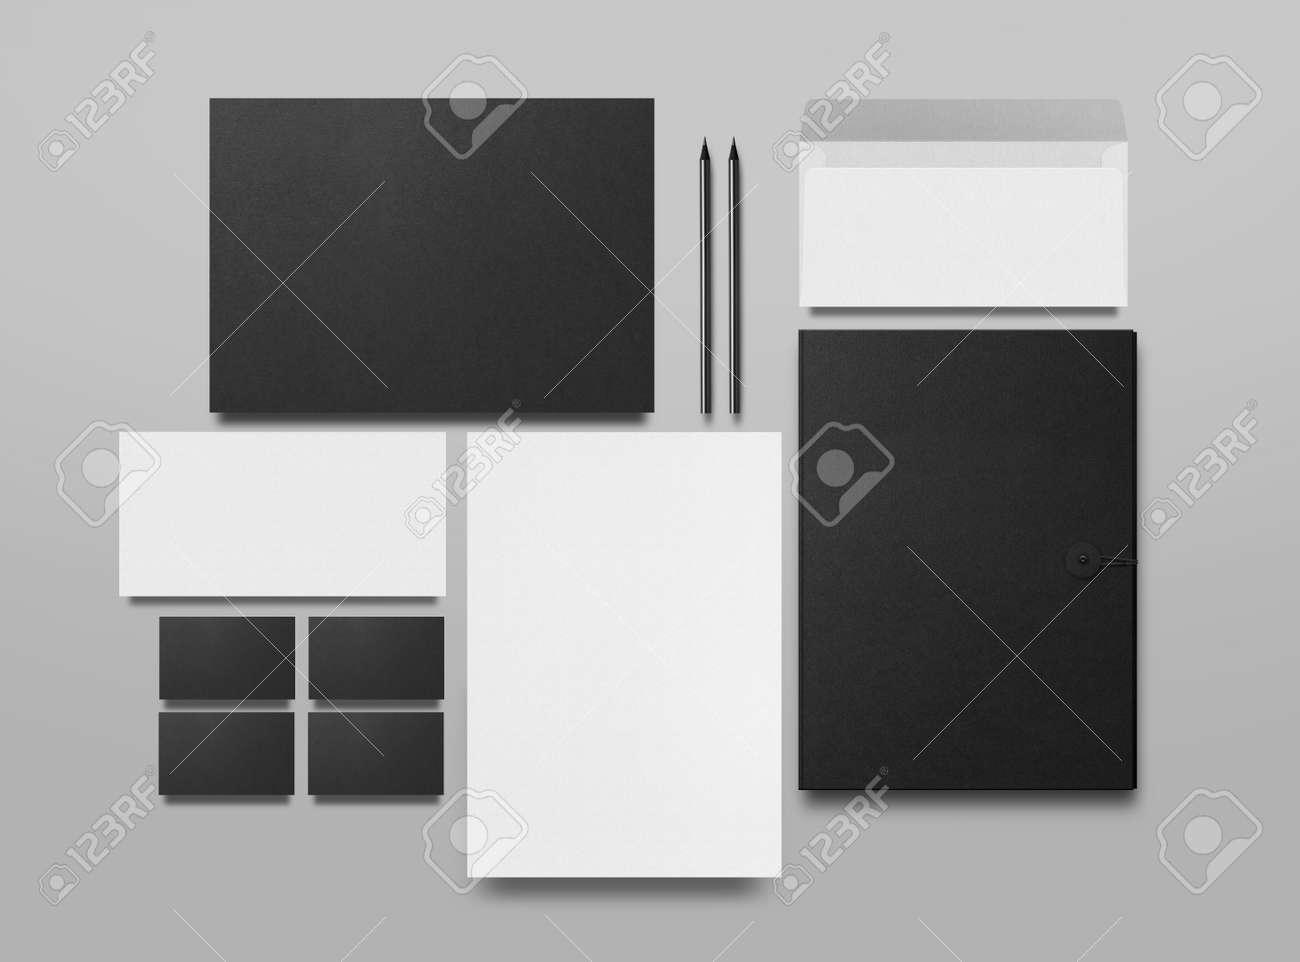 Mock up. Set of mock up elements on gray background. Blank objects for placing your design. Black folder, a sheet of paper, an envelope, a black business card and pencils. 3d illustration. - 150177831